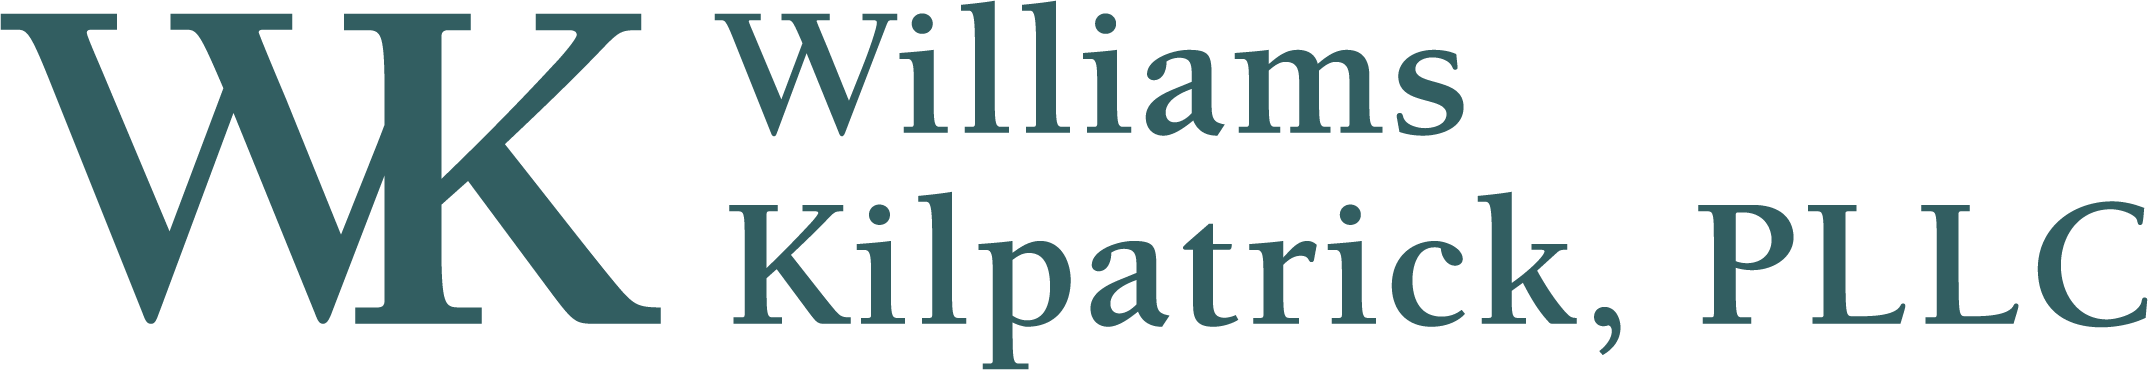 Williams_Kilpatrick_AltHorizontalLockup_Color